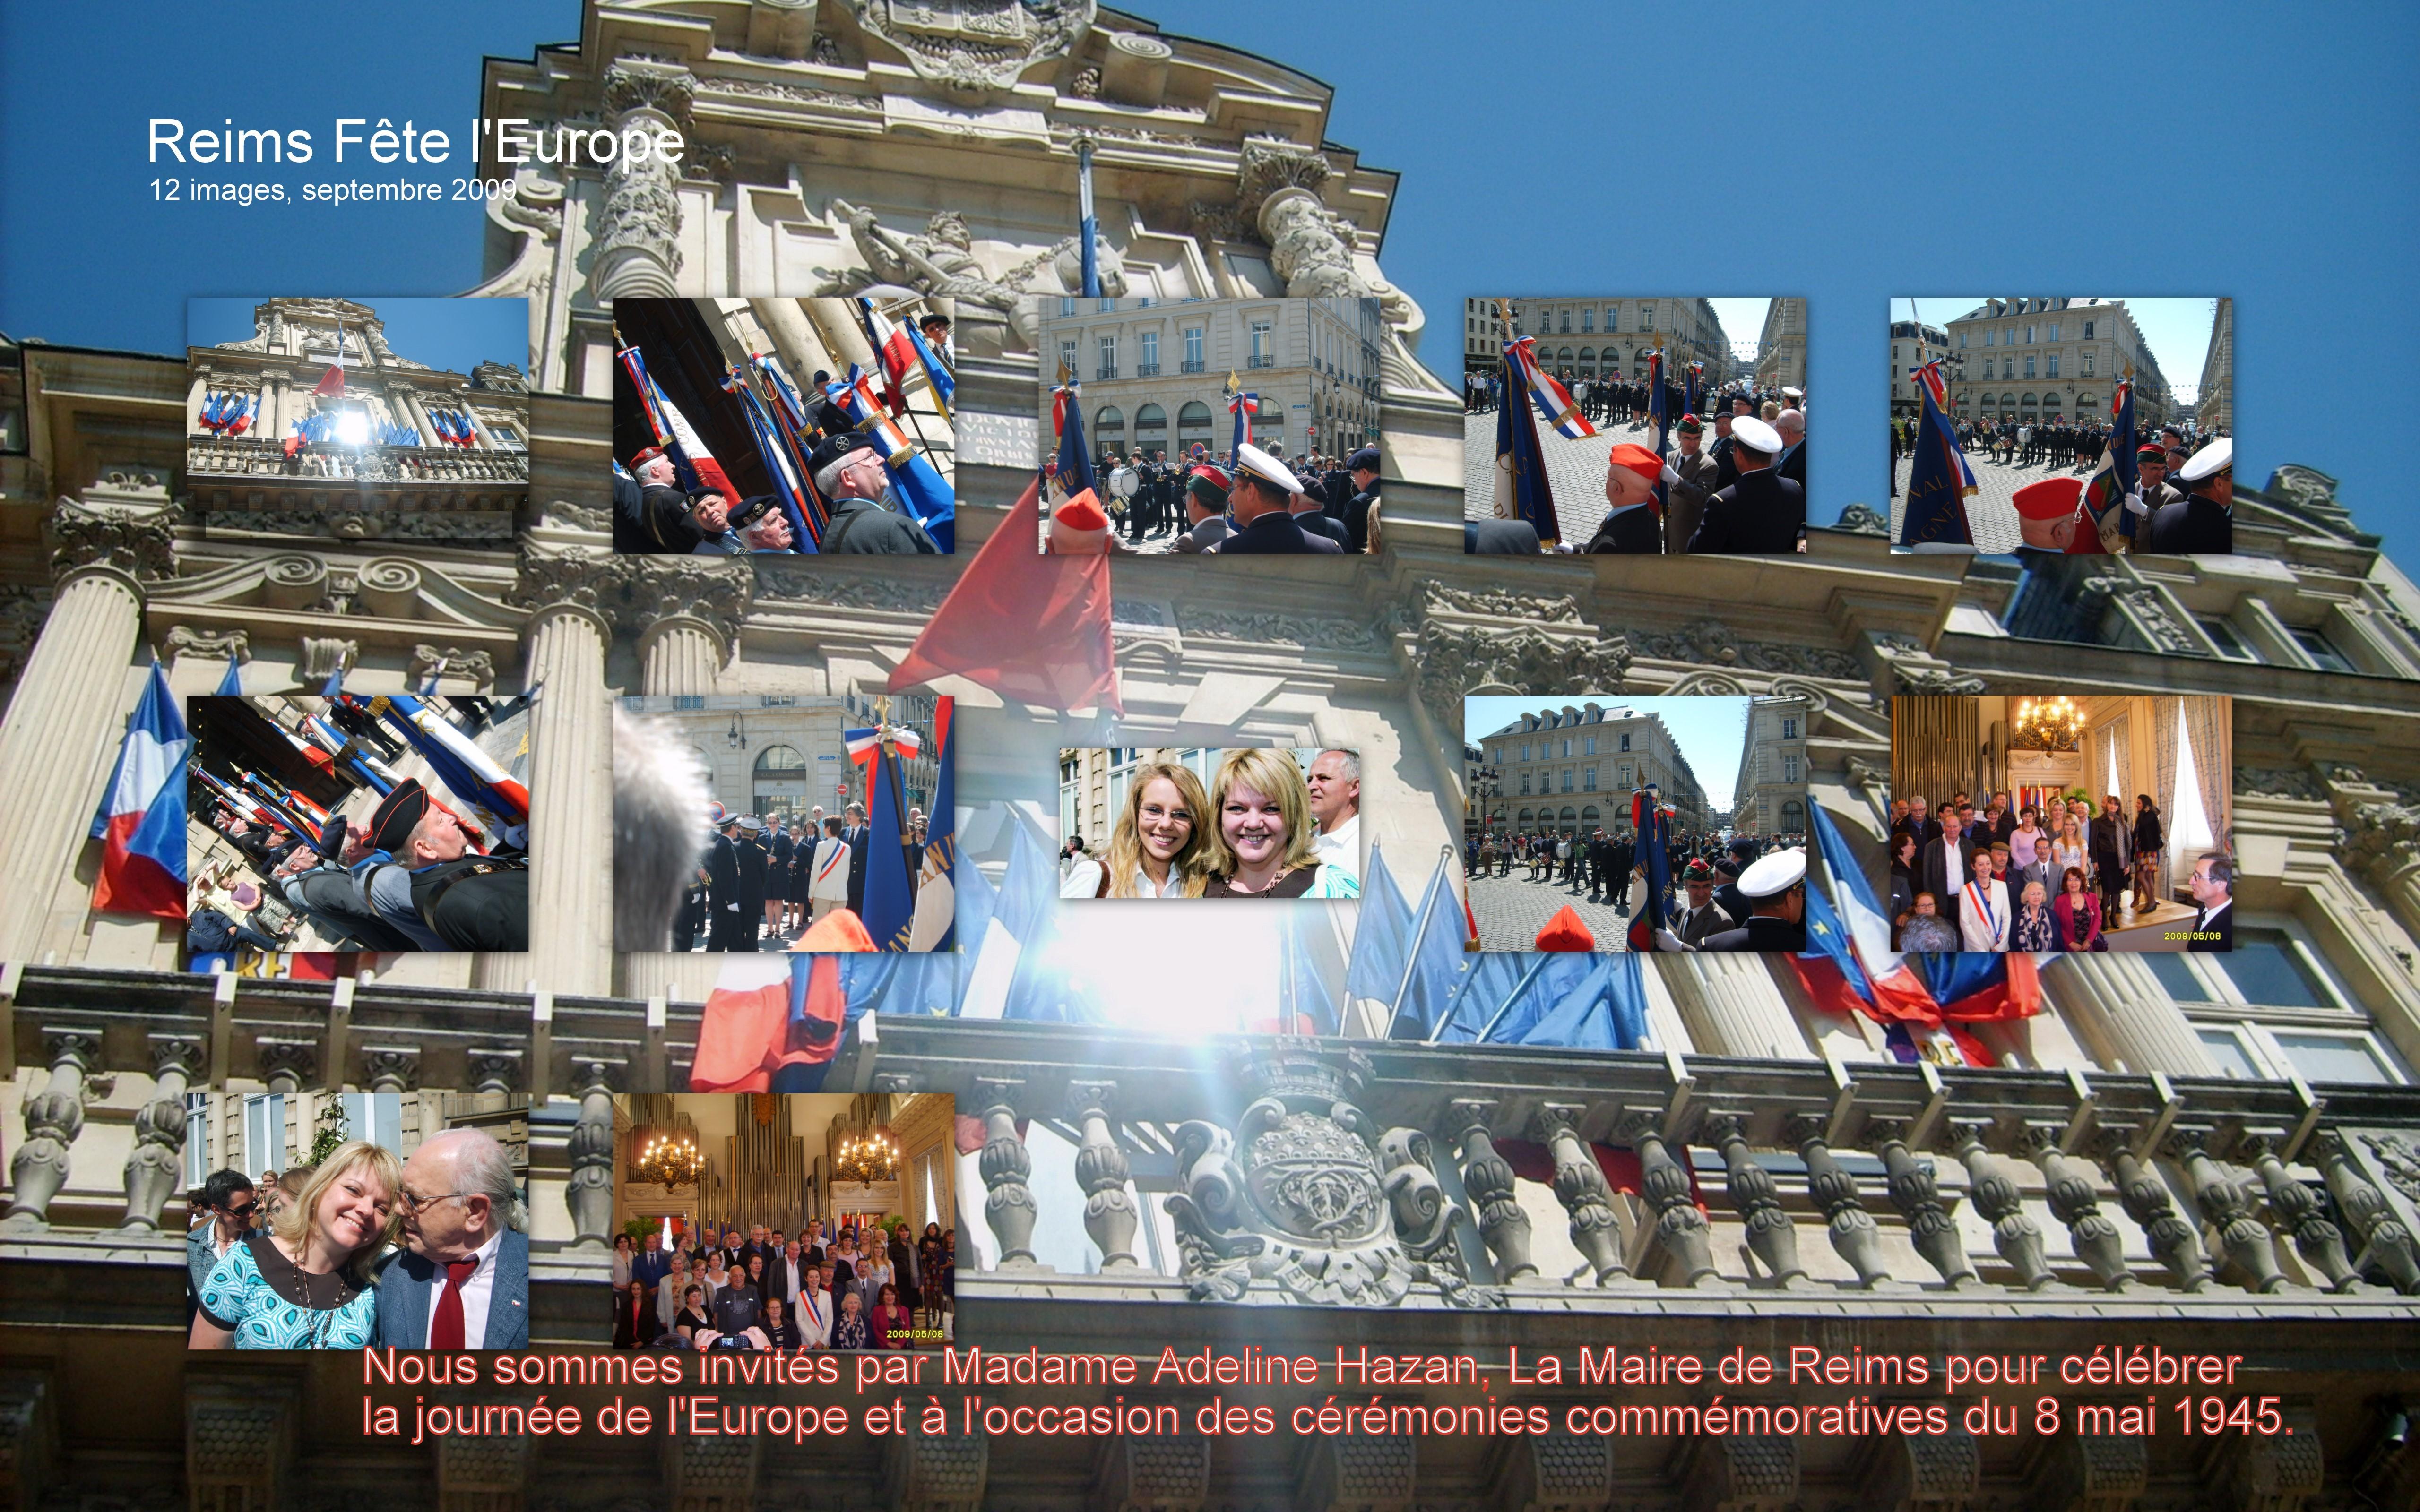 Reims Fête l'Europe